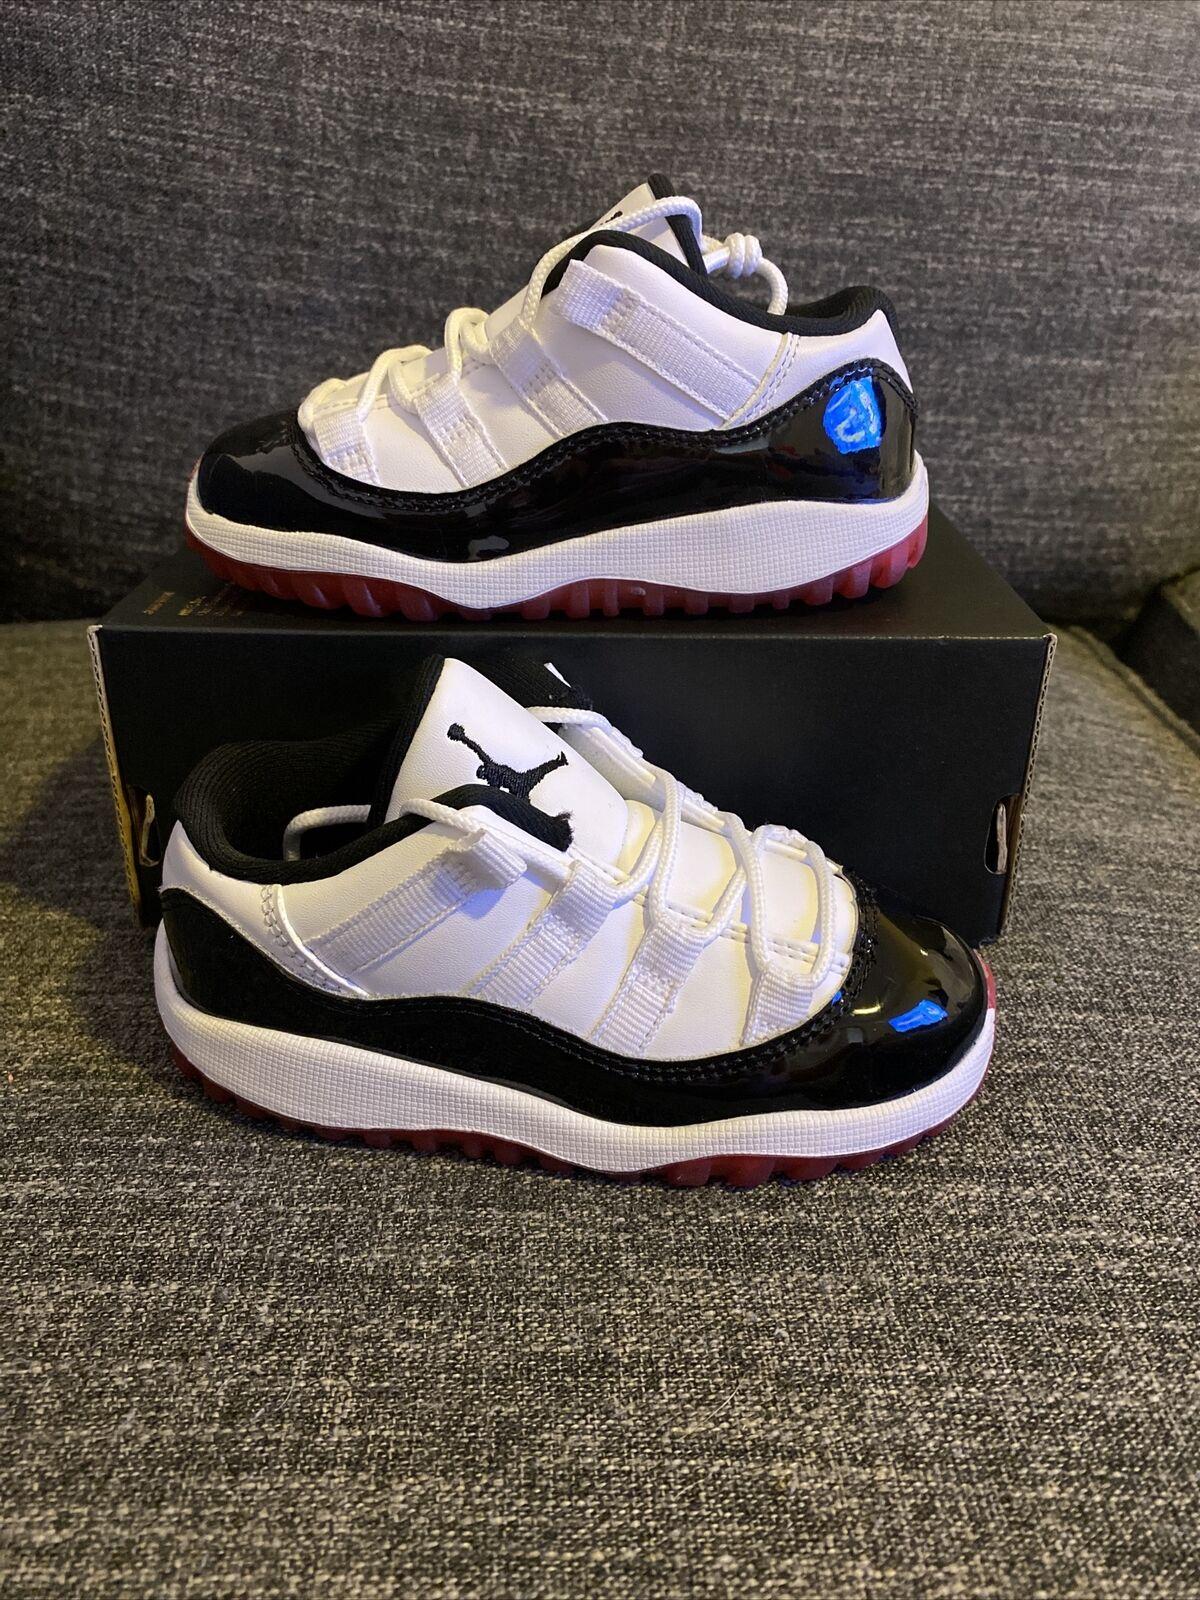 Nike Retro 11 Baby Jordan Concord Low